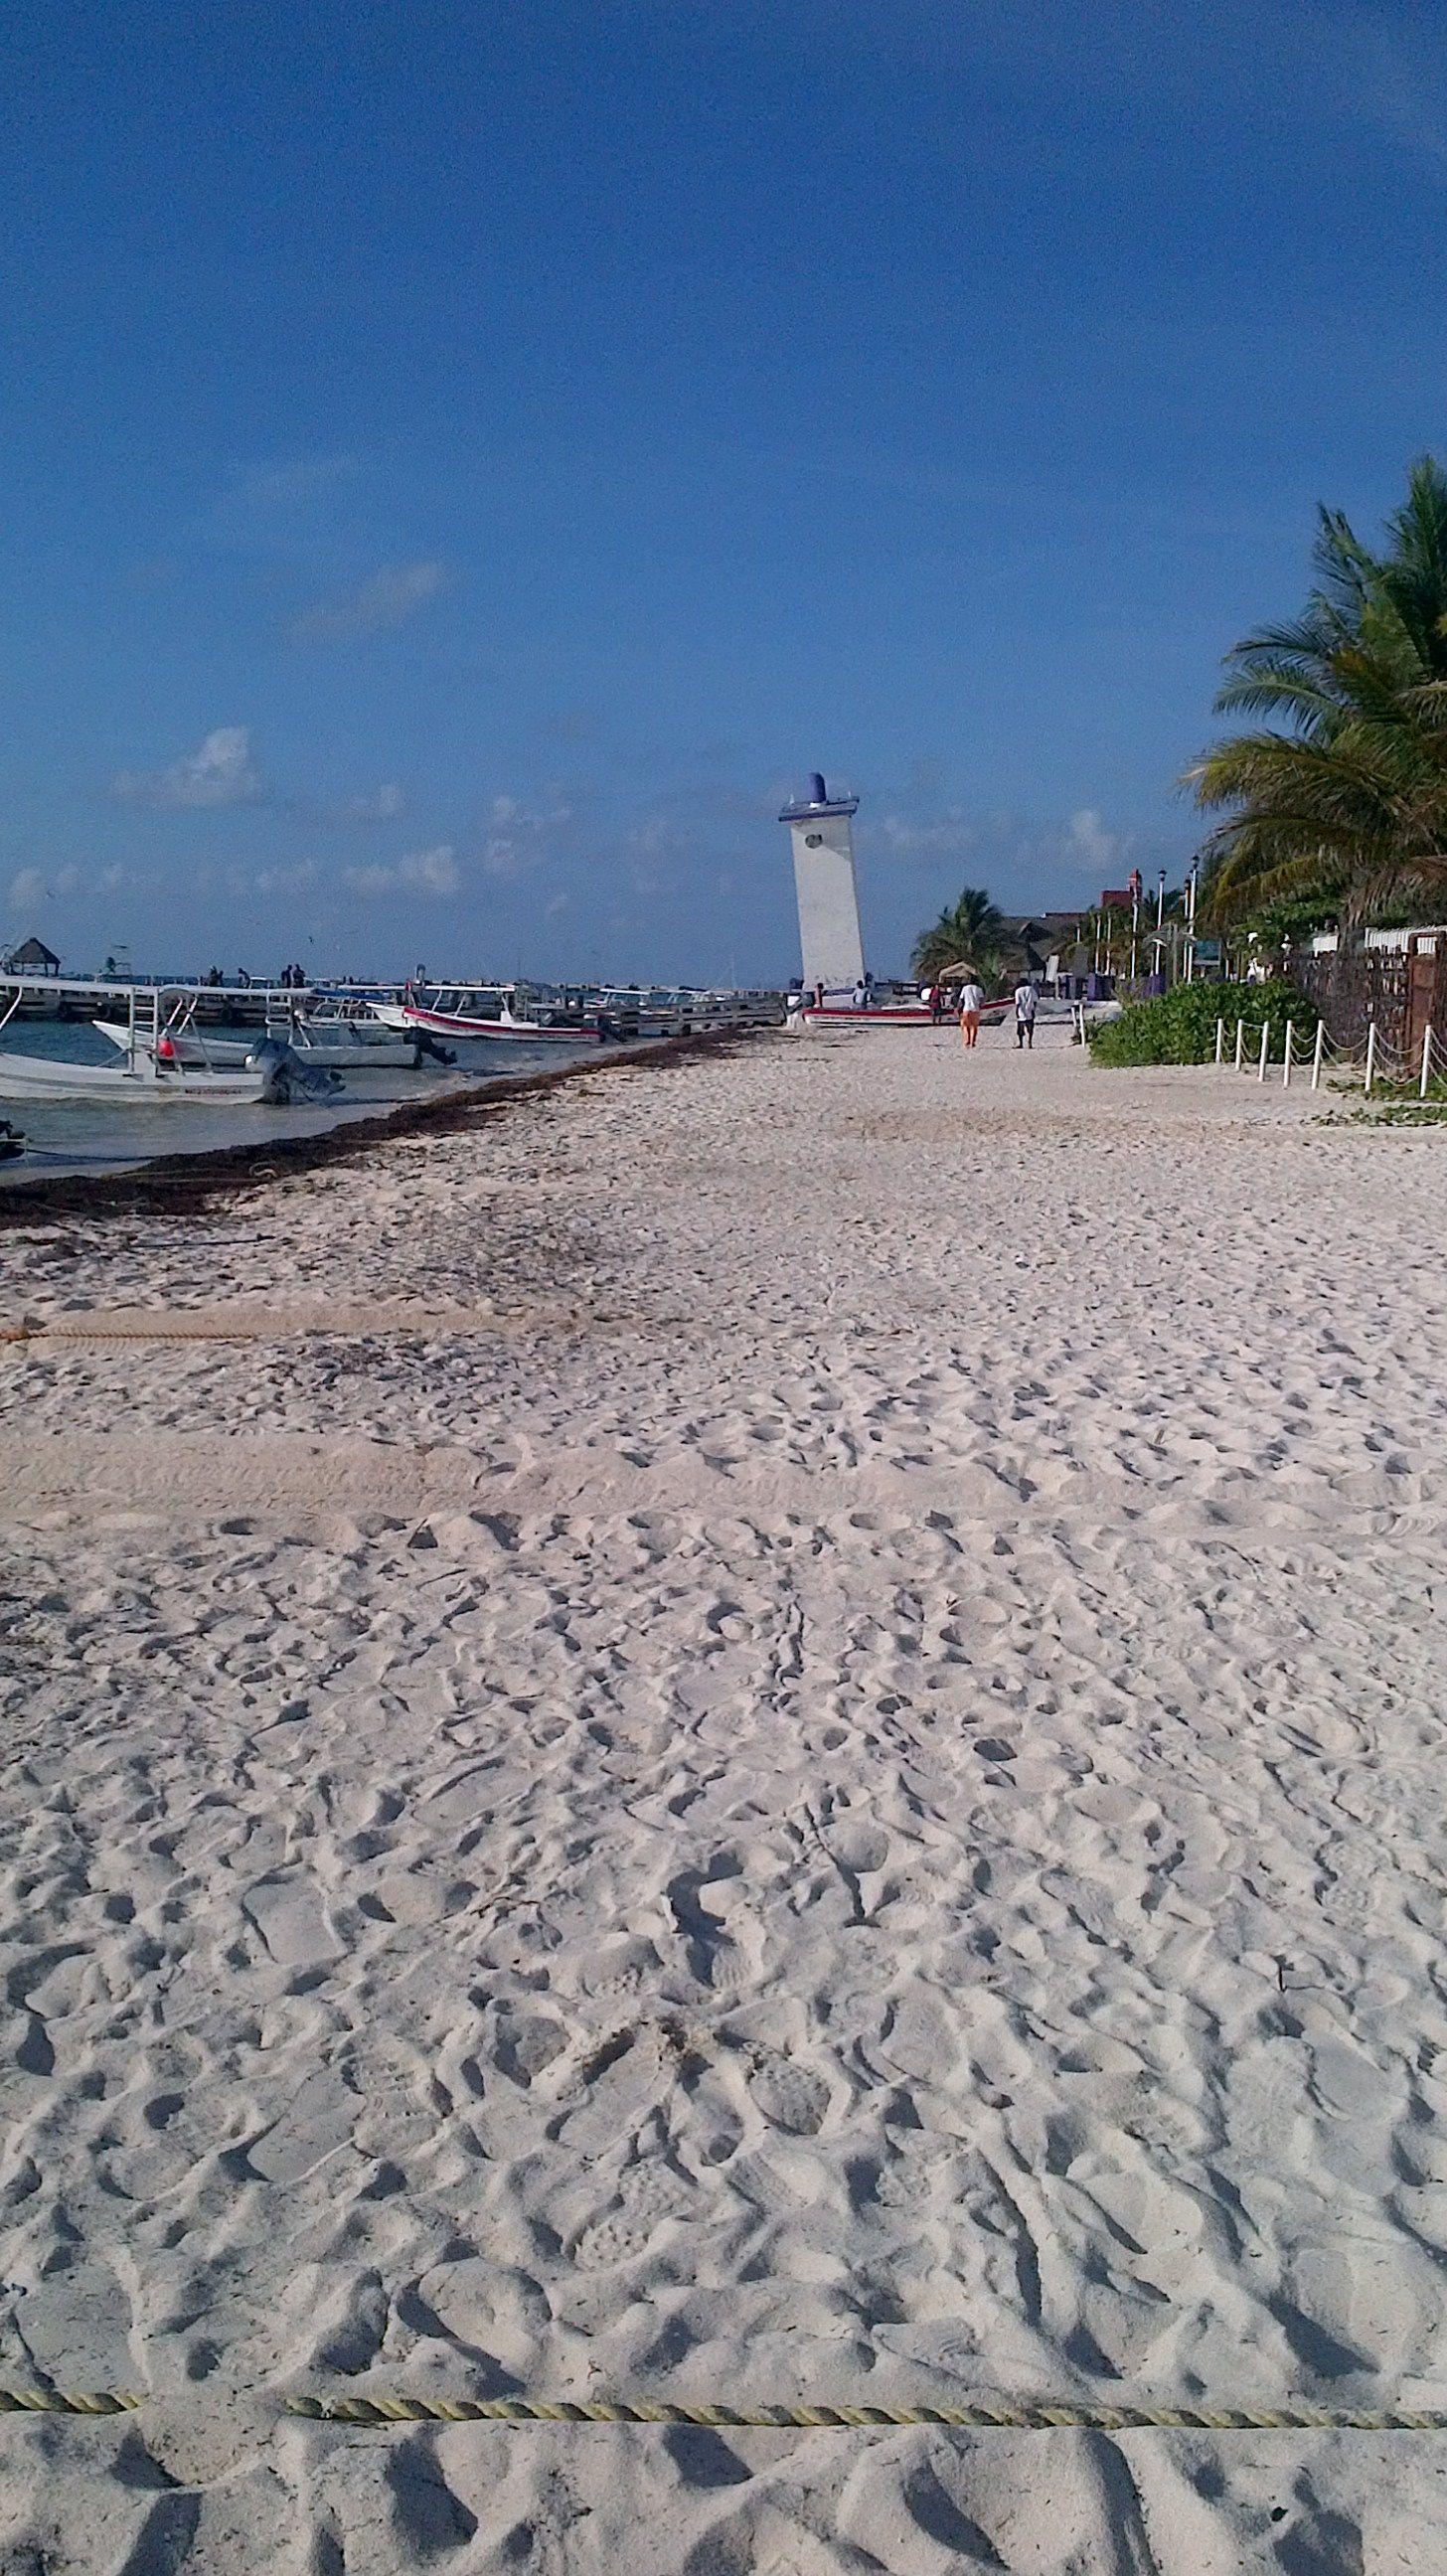 Puerto Morelos Logo Leaning Lighthouse Felled By Hurricane Gilbert Riviera Maya Resorts Puerto Morelos Mayan Riviera